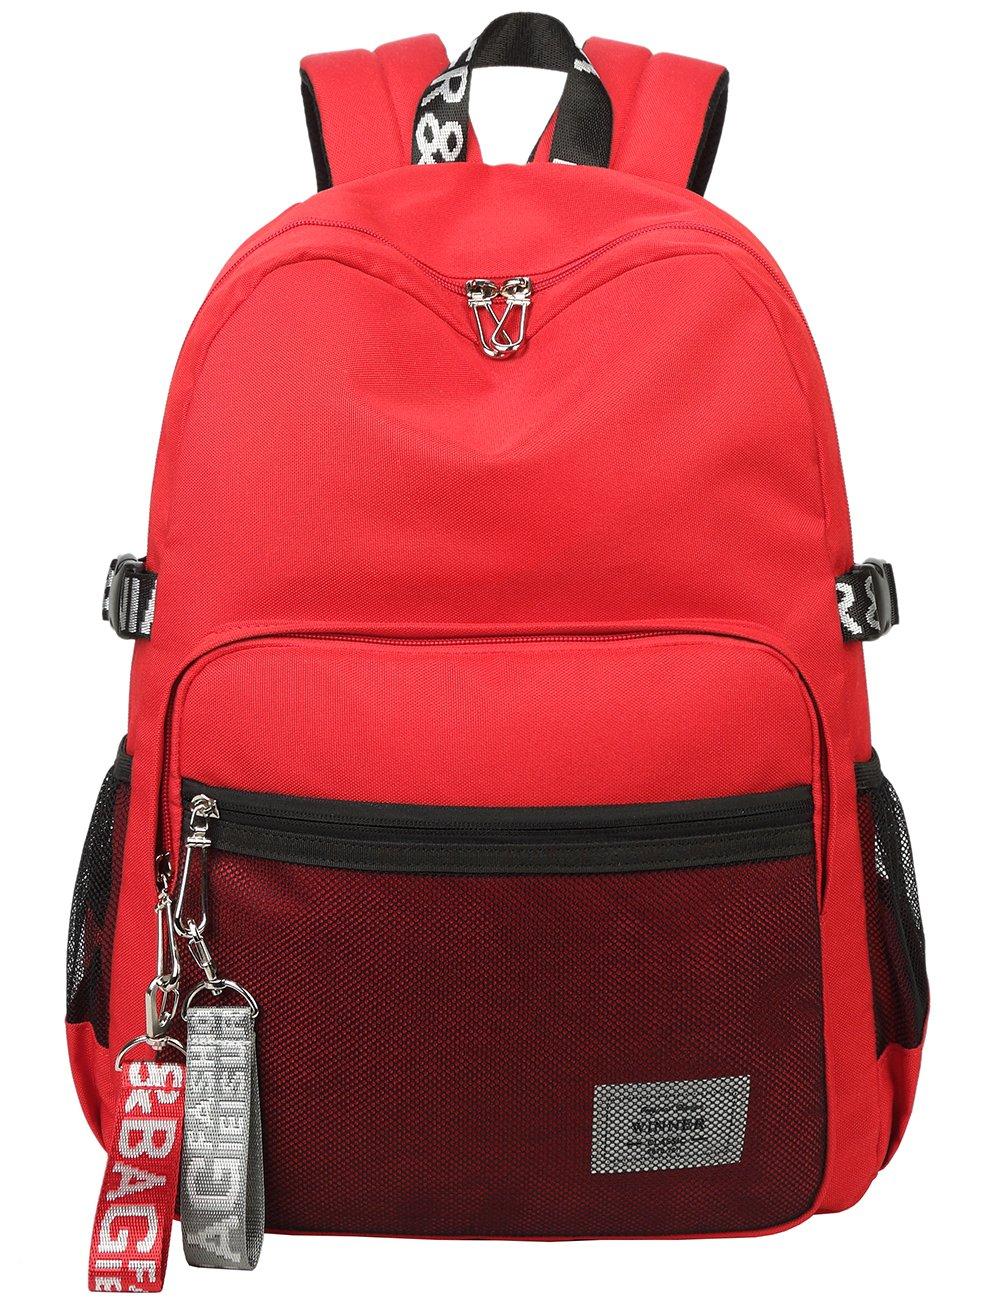 Edmundy CWC Chad Wild Clay Ninja Shoulder Bag For Women,Simple Yet Stylish Canvas Shoulder Bag Black.